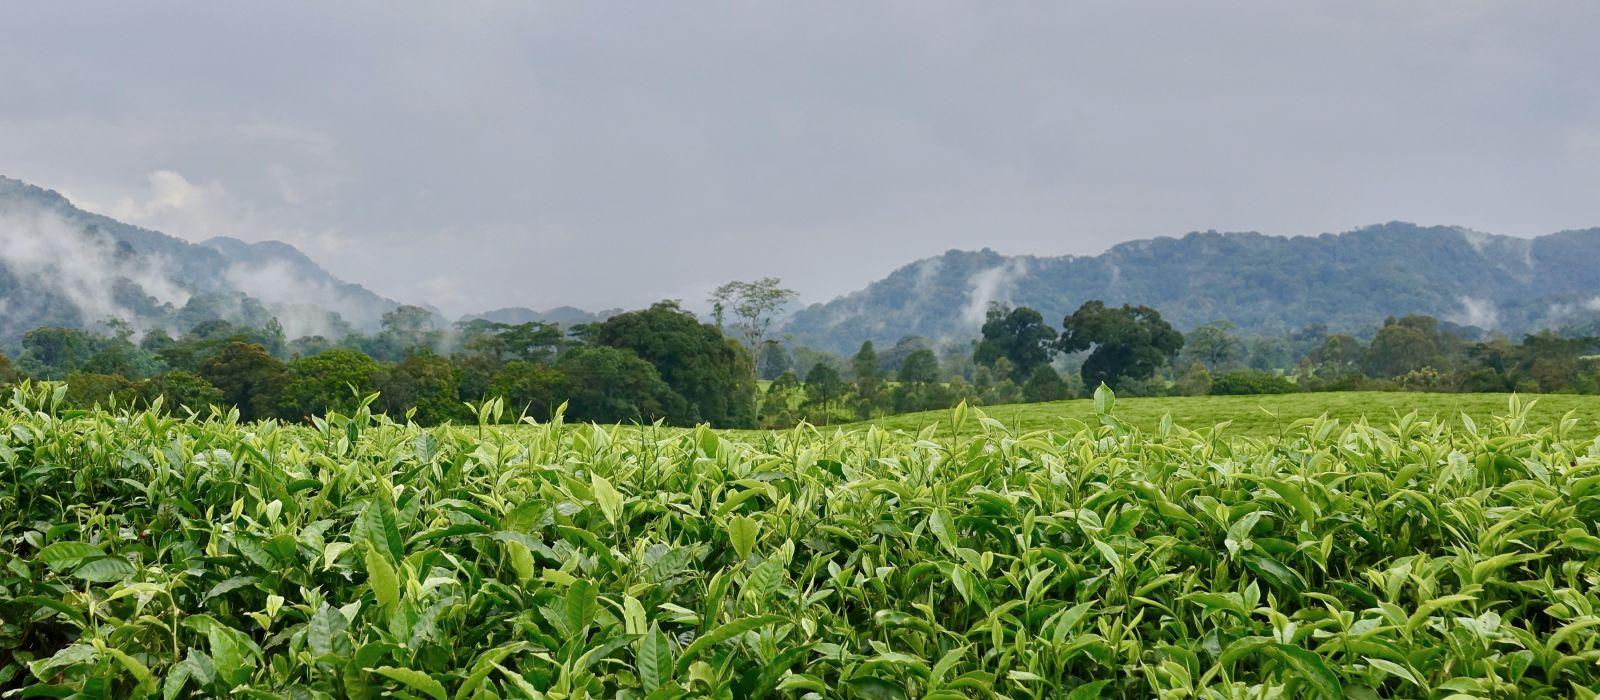 Rainforest Nyungwe, Tea Plantation,Rwanda, Africa, Landscape